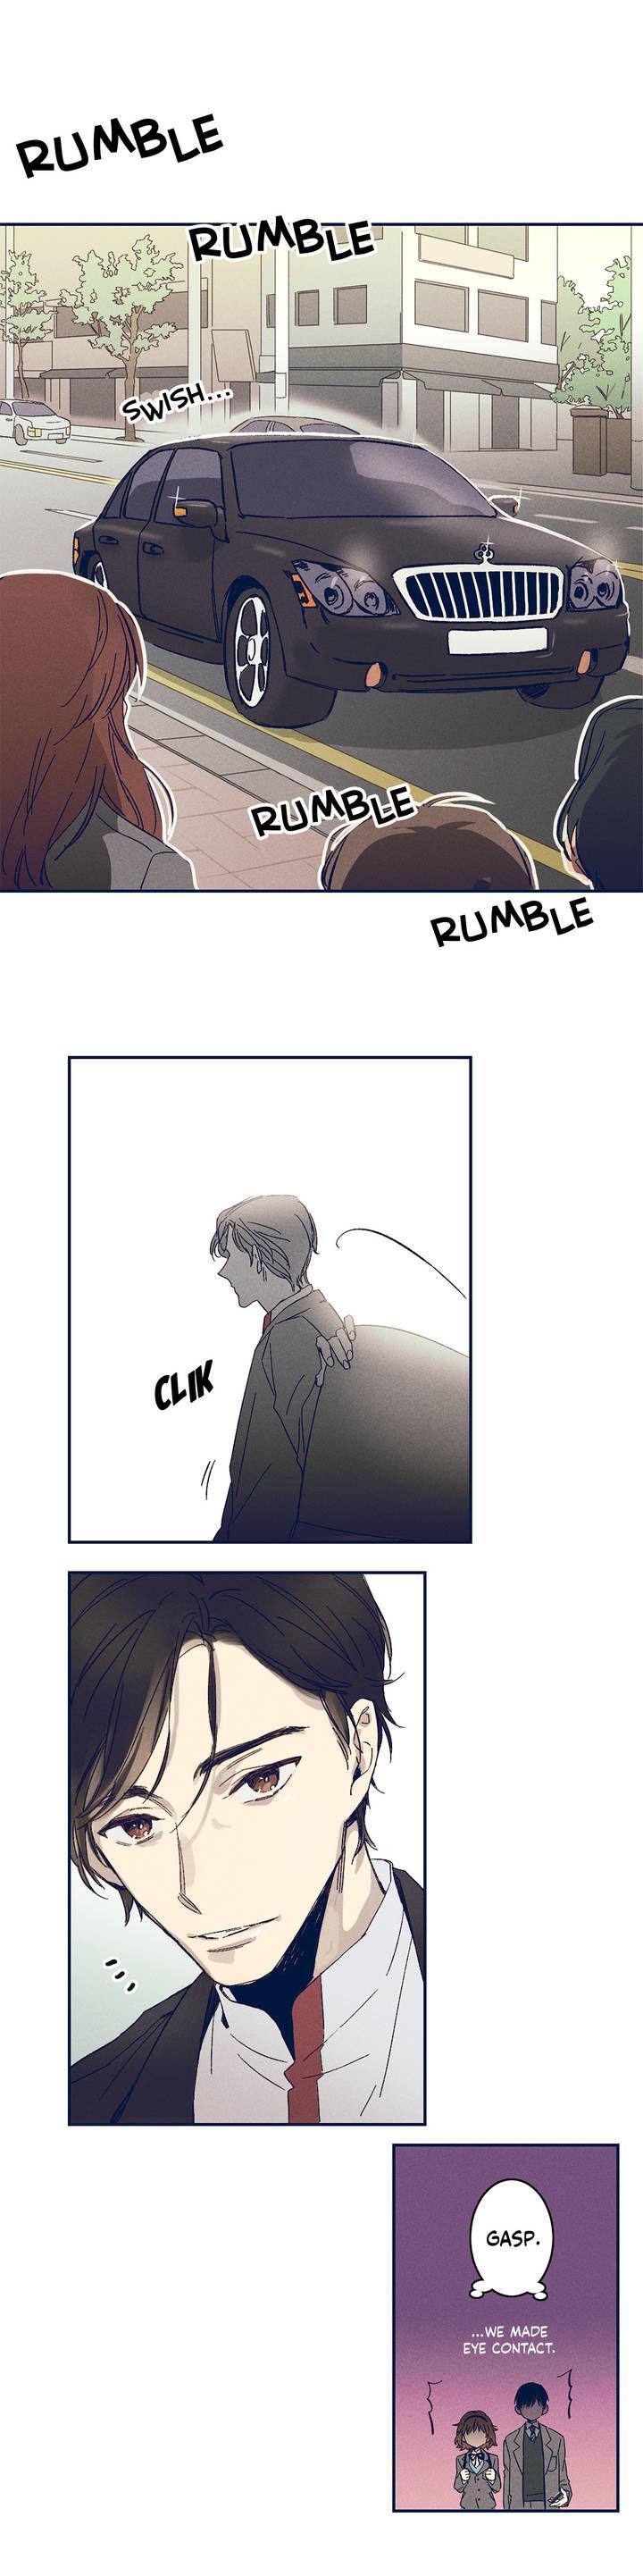 Forever Mine - Chapter 3